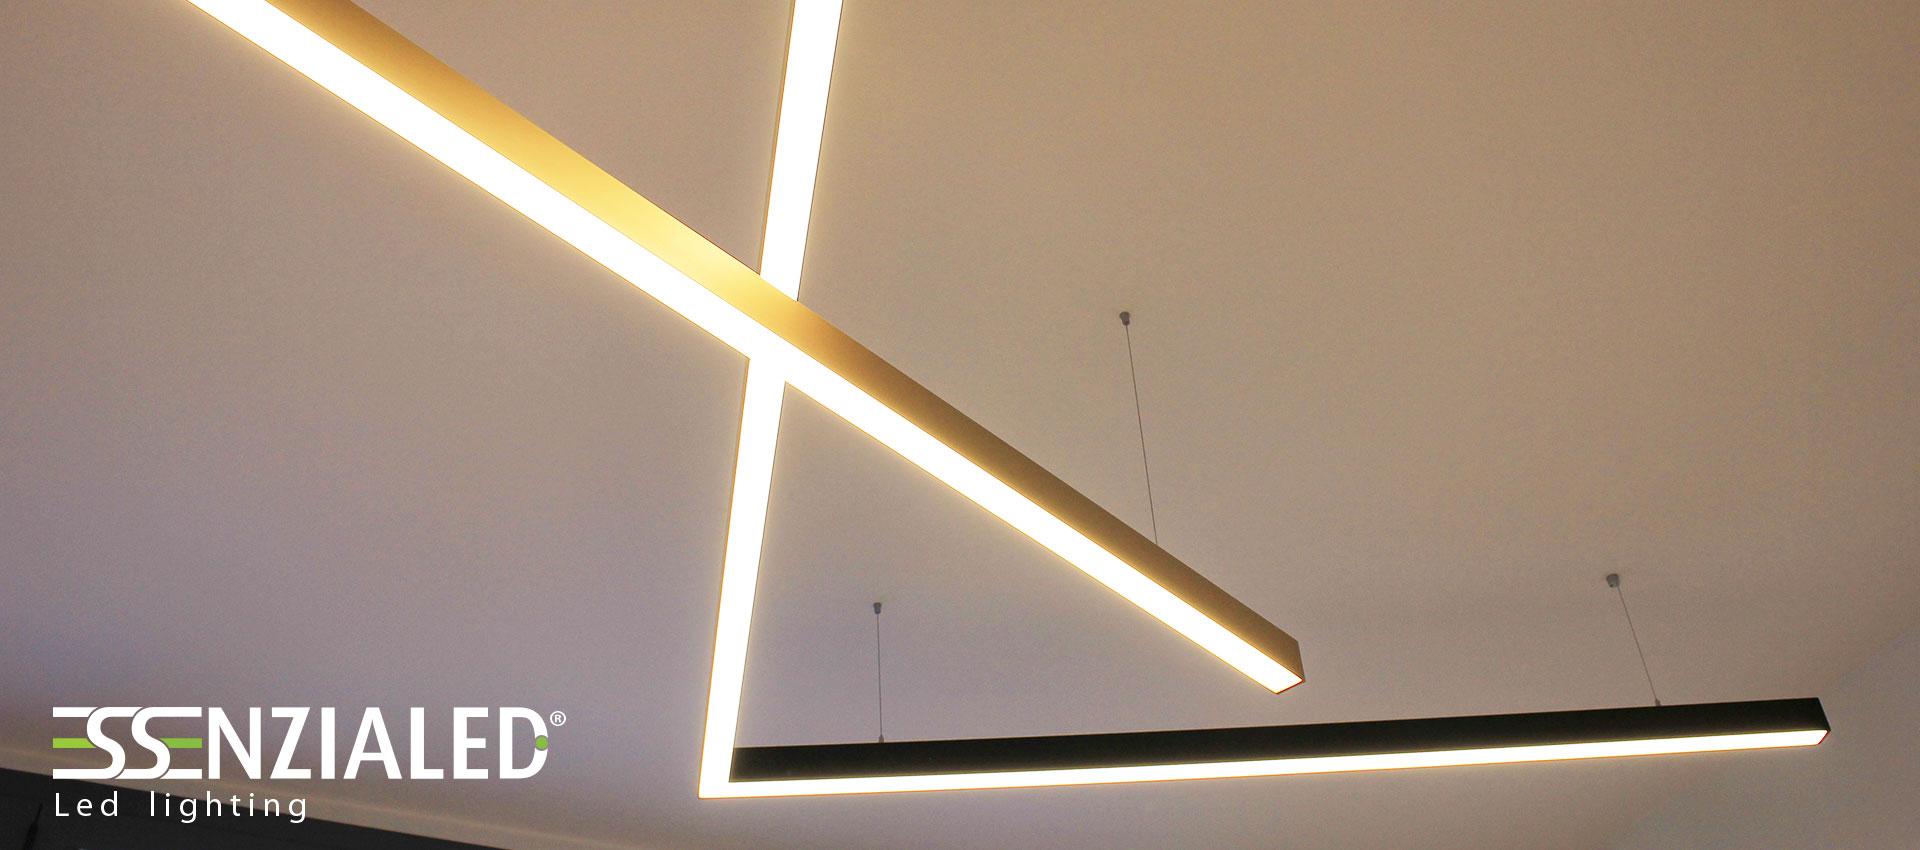 POWER IN XL - Profili a Led a sospensione - EssenzialedEssenzialed – Illumina...